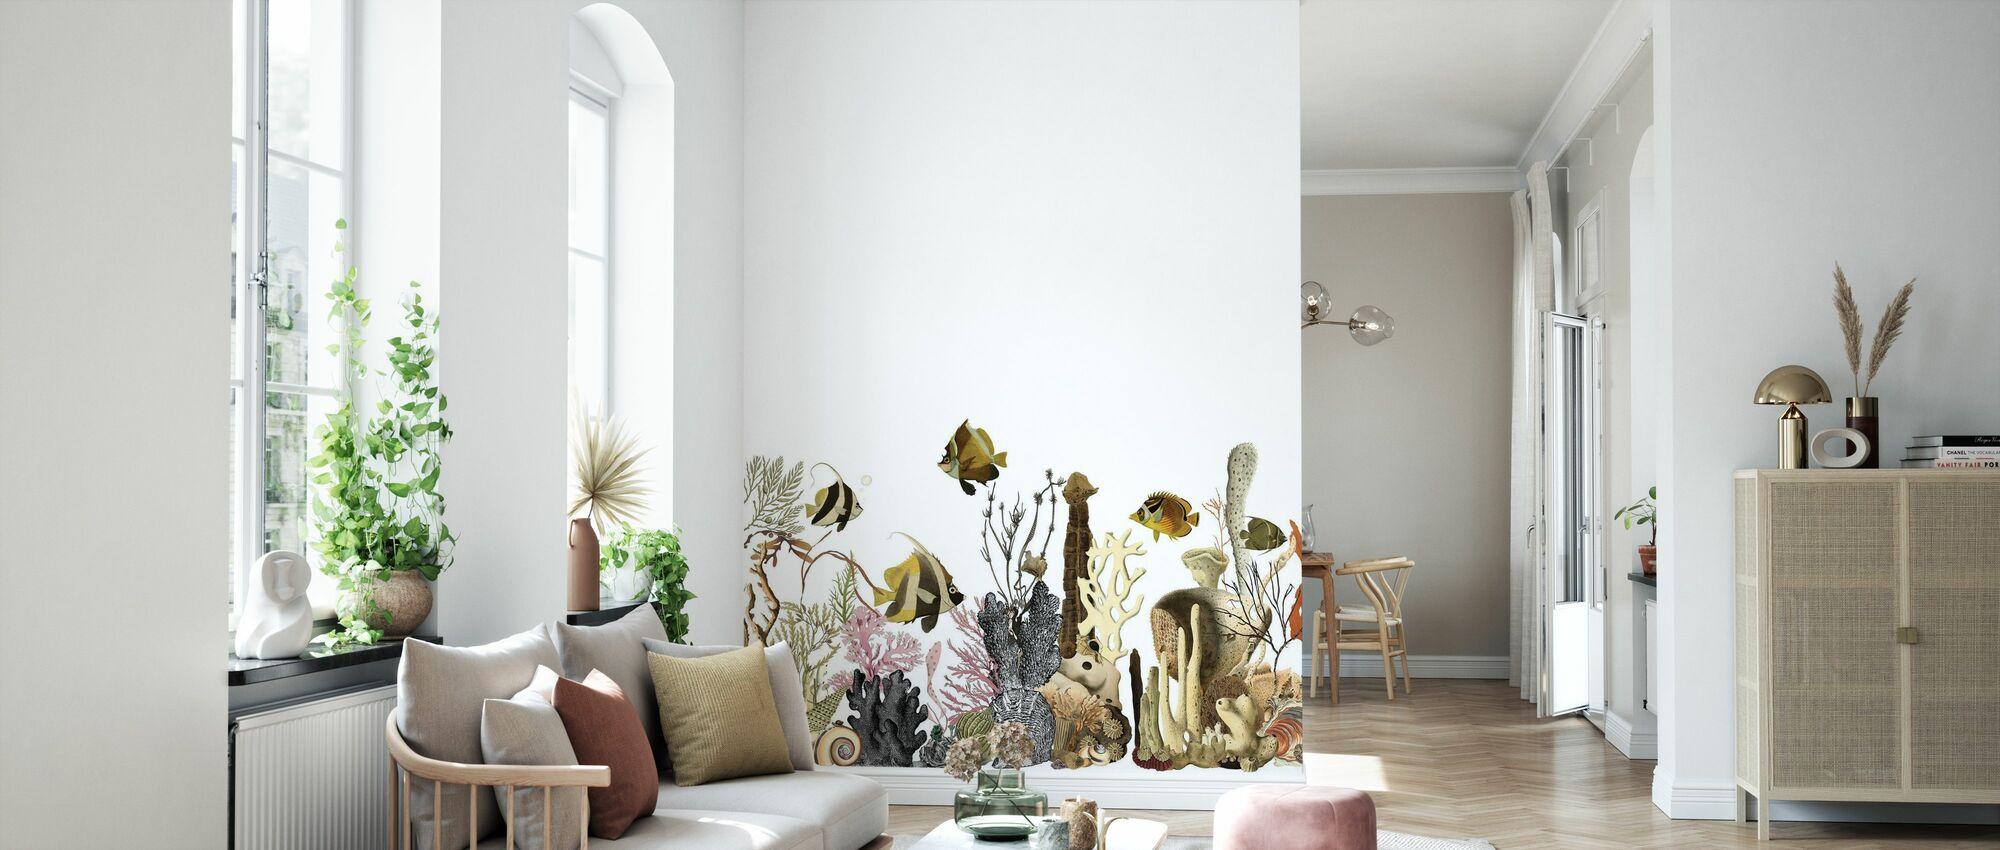 Aquarius - White - Wallpaper - Living Room